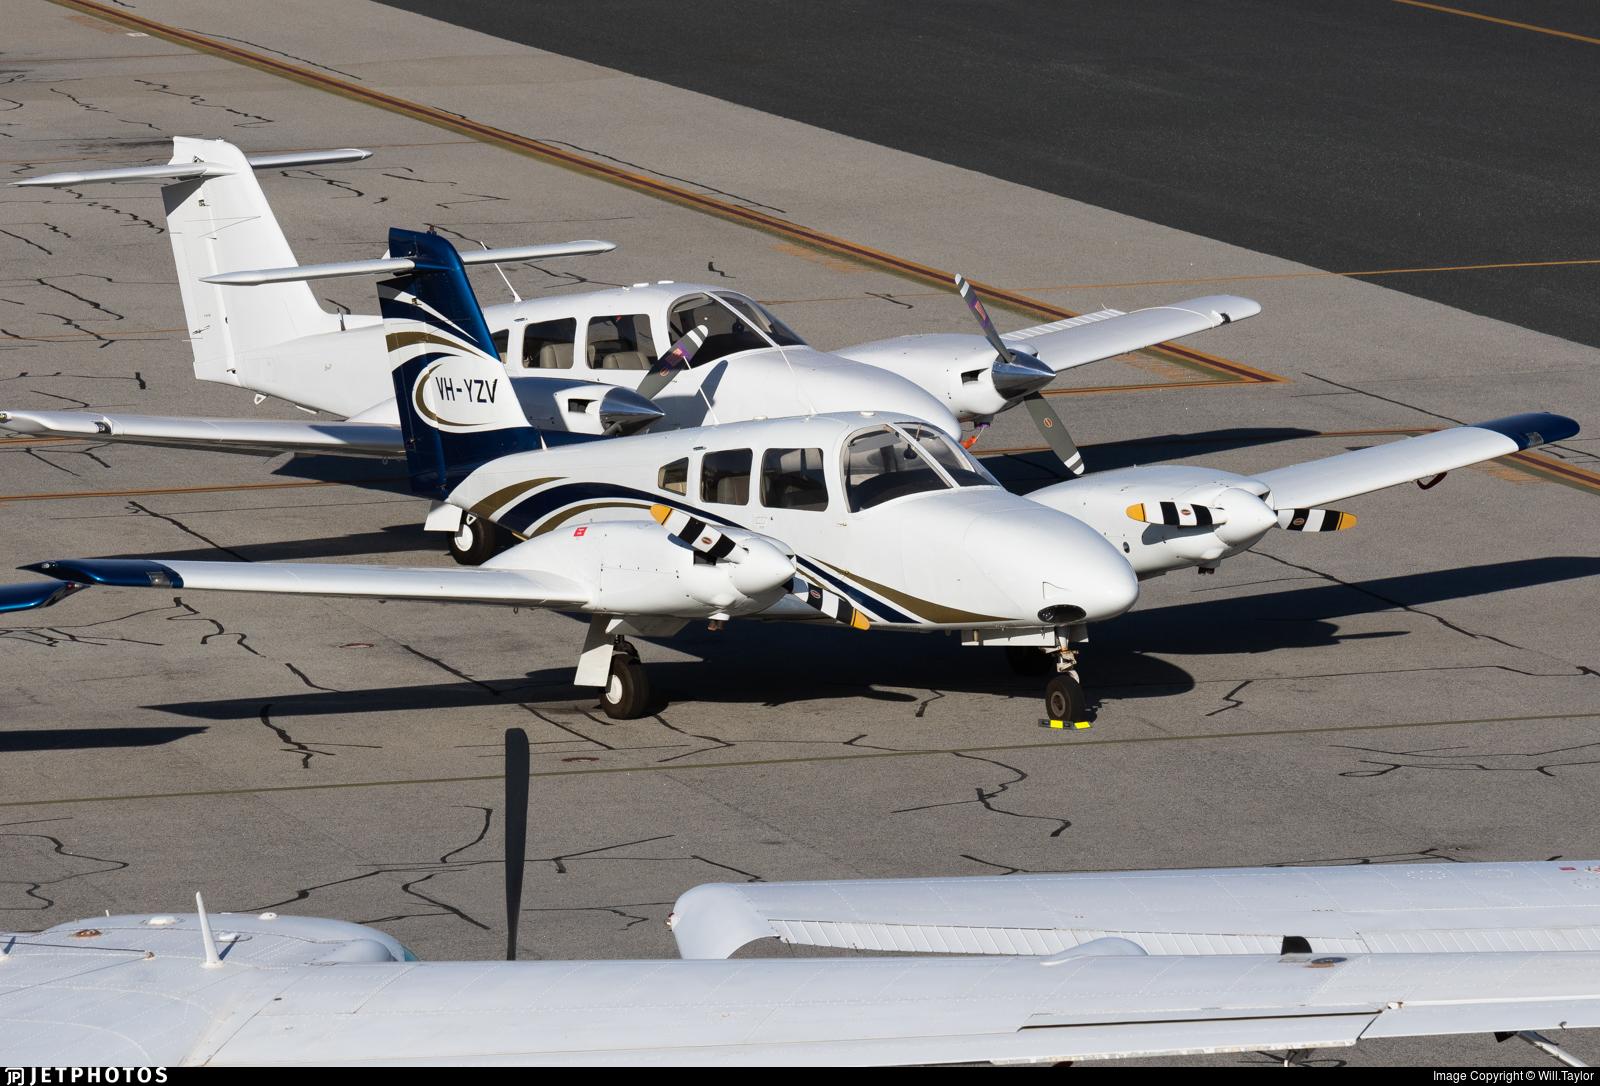 VH-YZV - Piper PA-44-180 Seminole - Airflite